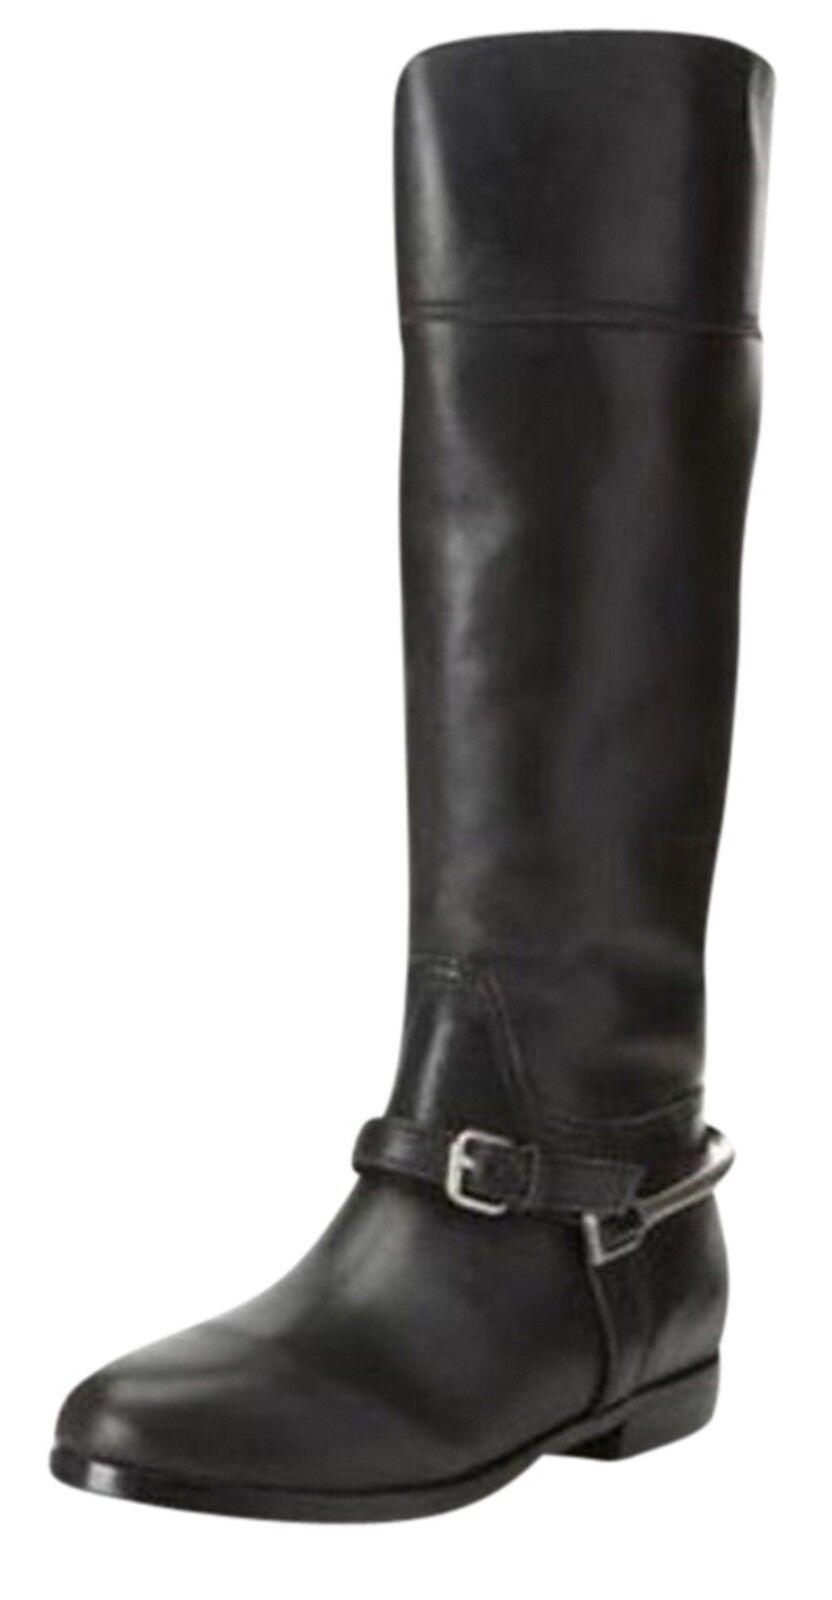 Pour botas La Victoire Marne para mujer botas Pour de montar de cuero negro, tamaño  7.5 M. bb9c75